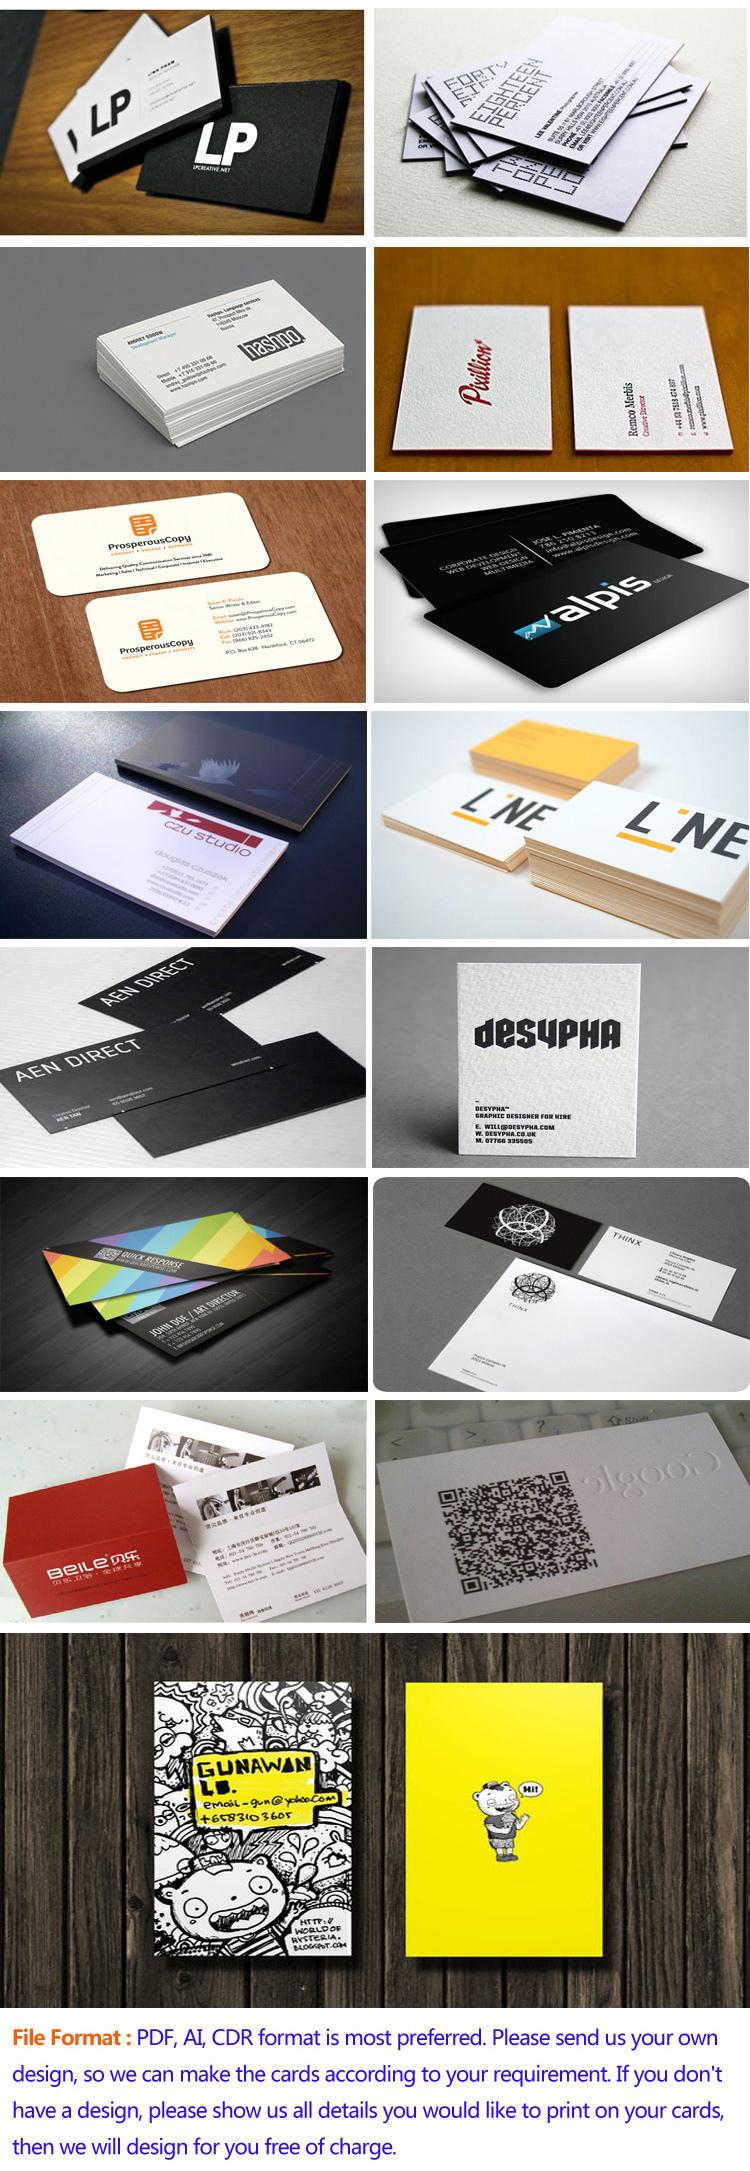 Cotton Paper 3d Effect Business Card,Emboss Press Business Cards ...